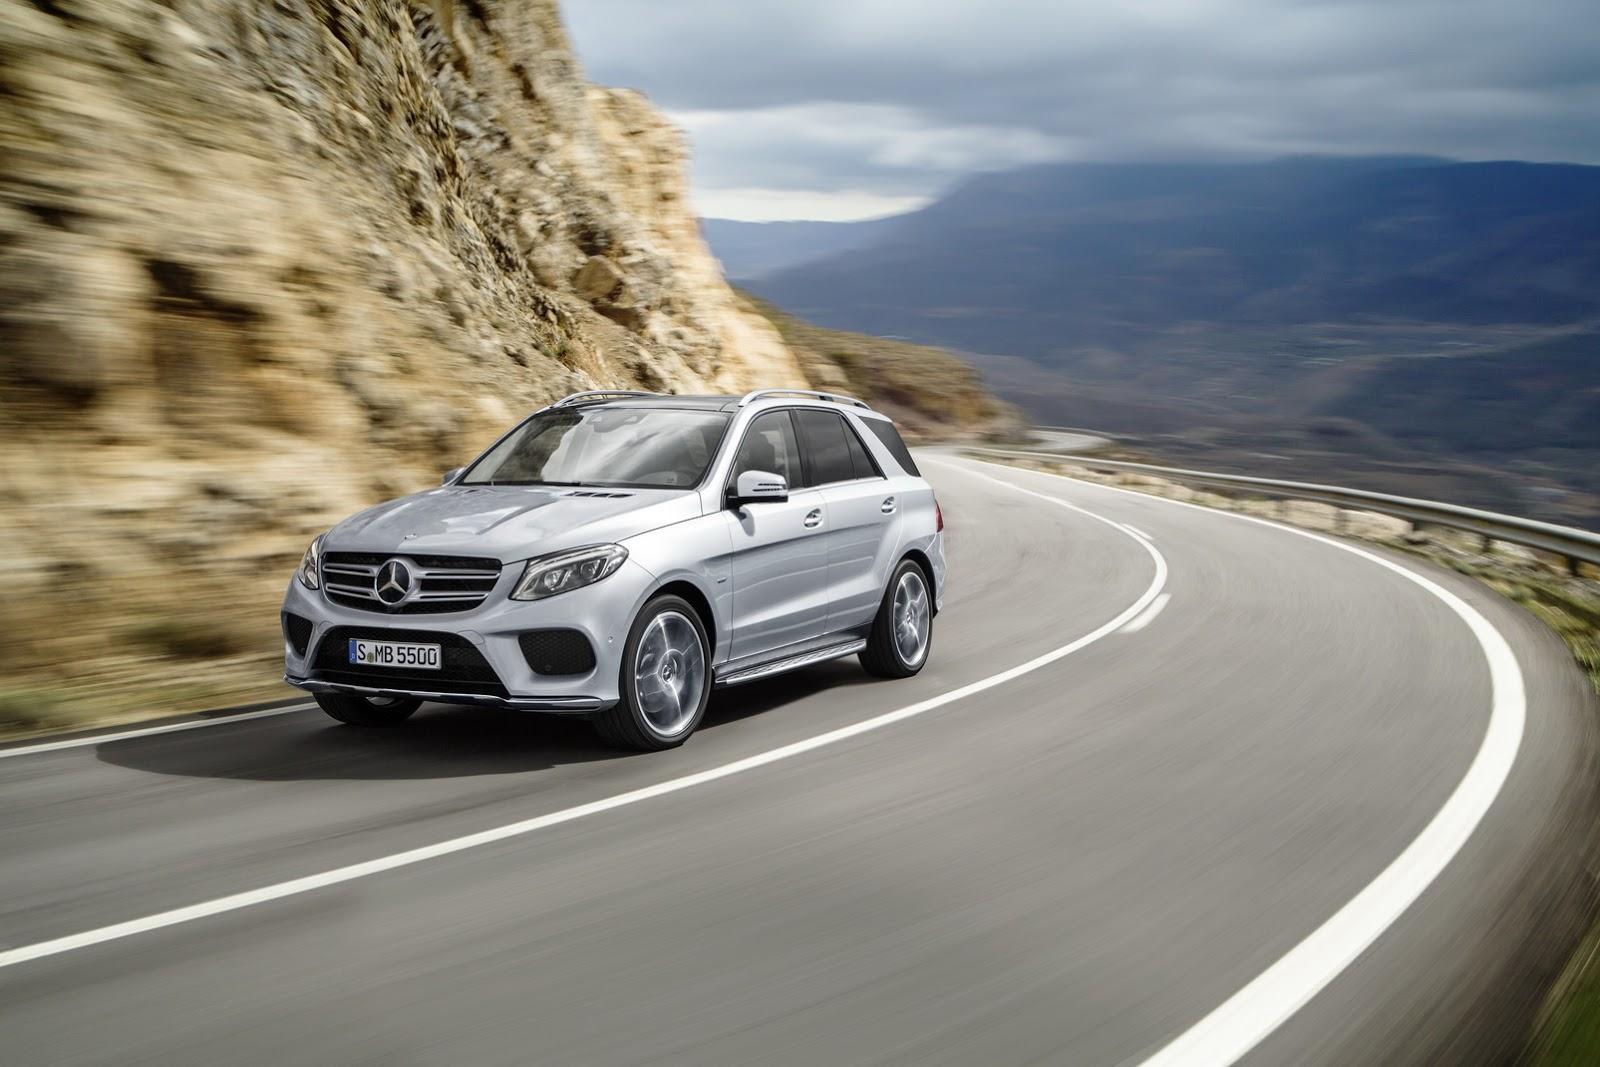 Mercedes-Benz GLE e GLE 63 2015 - Mercedes-Benz - Autopareri